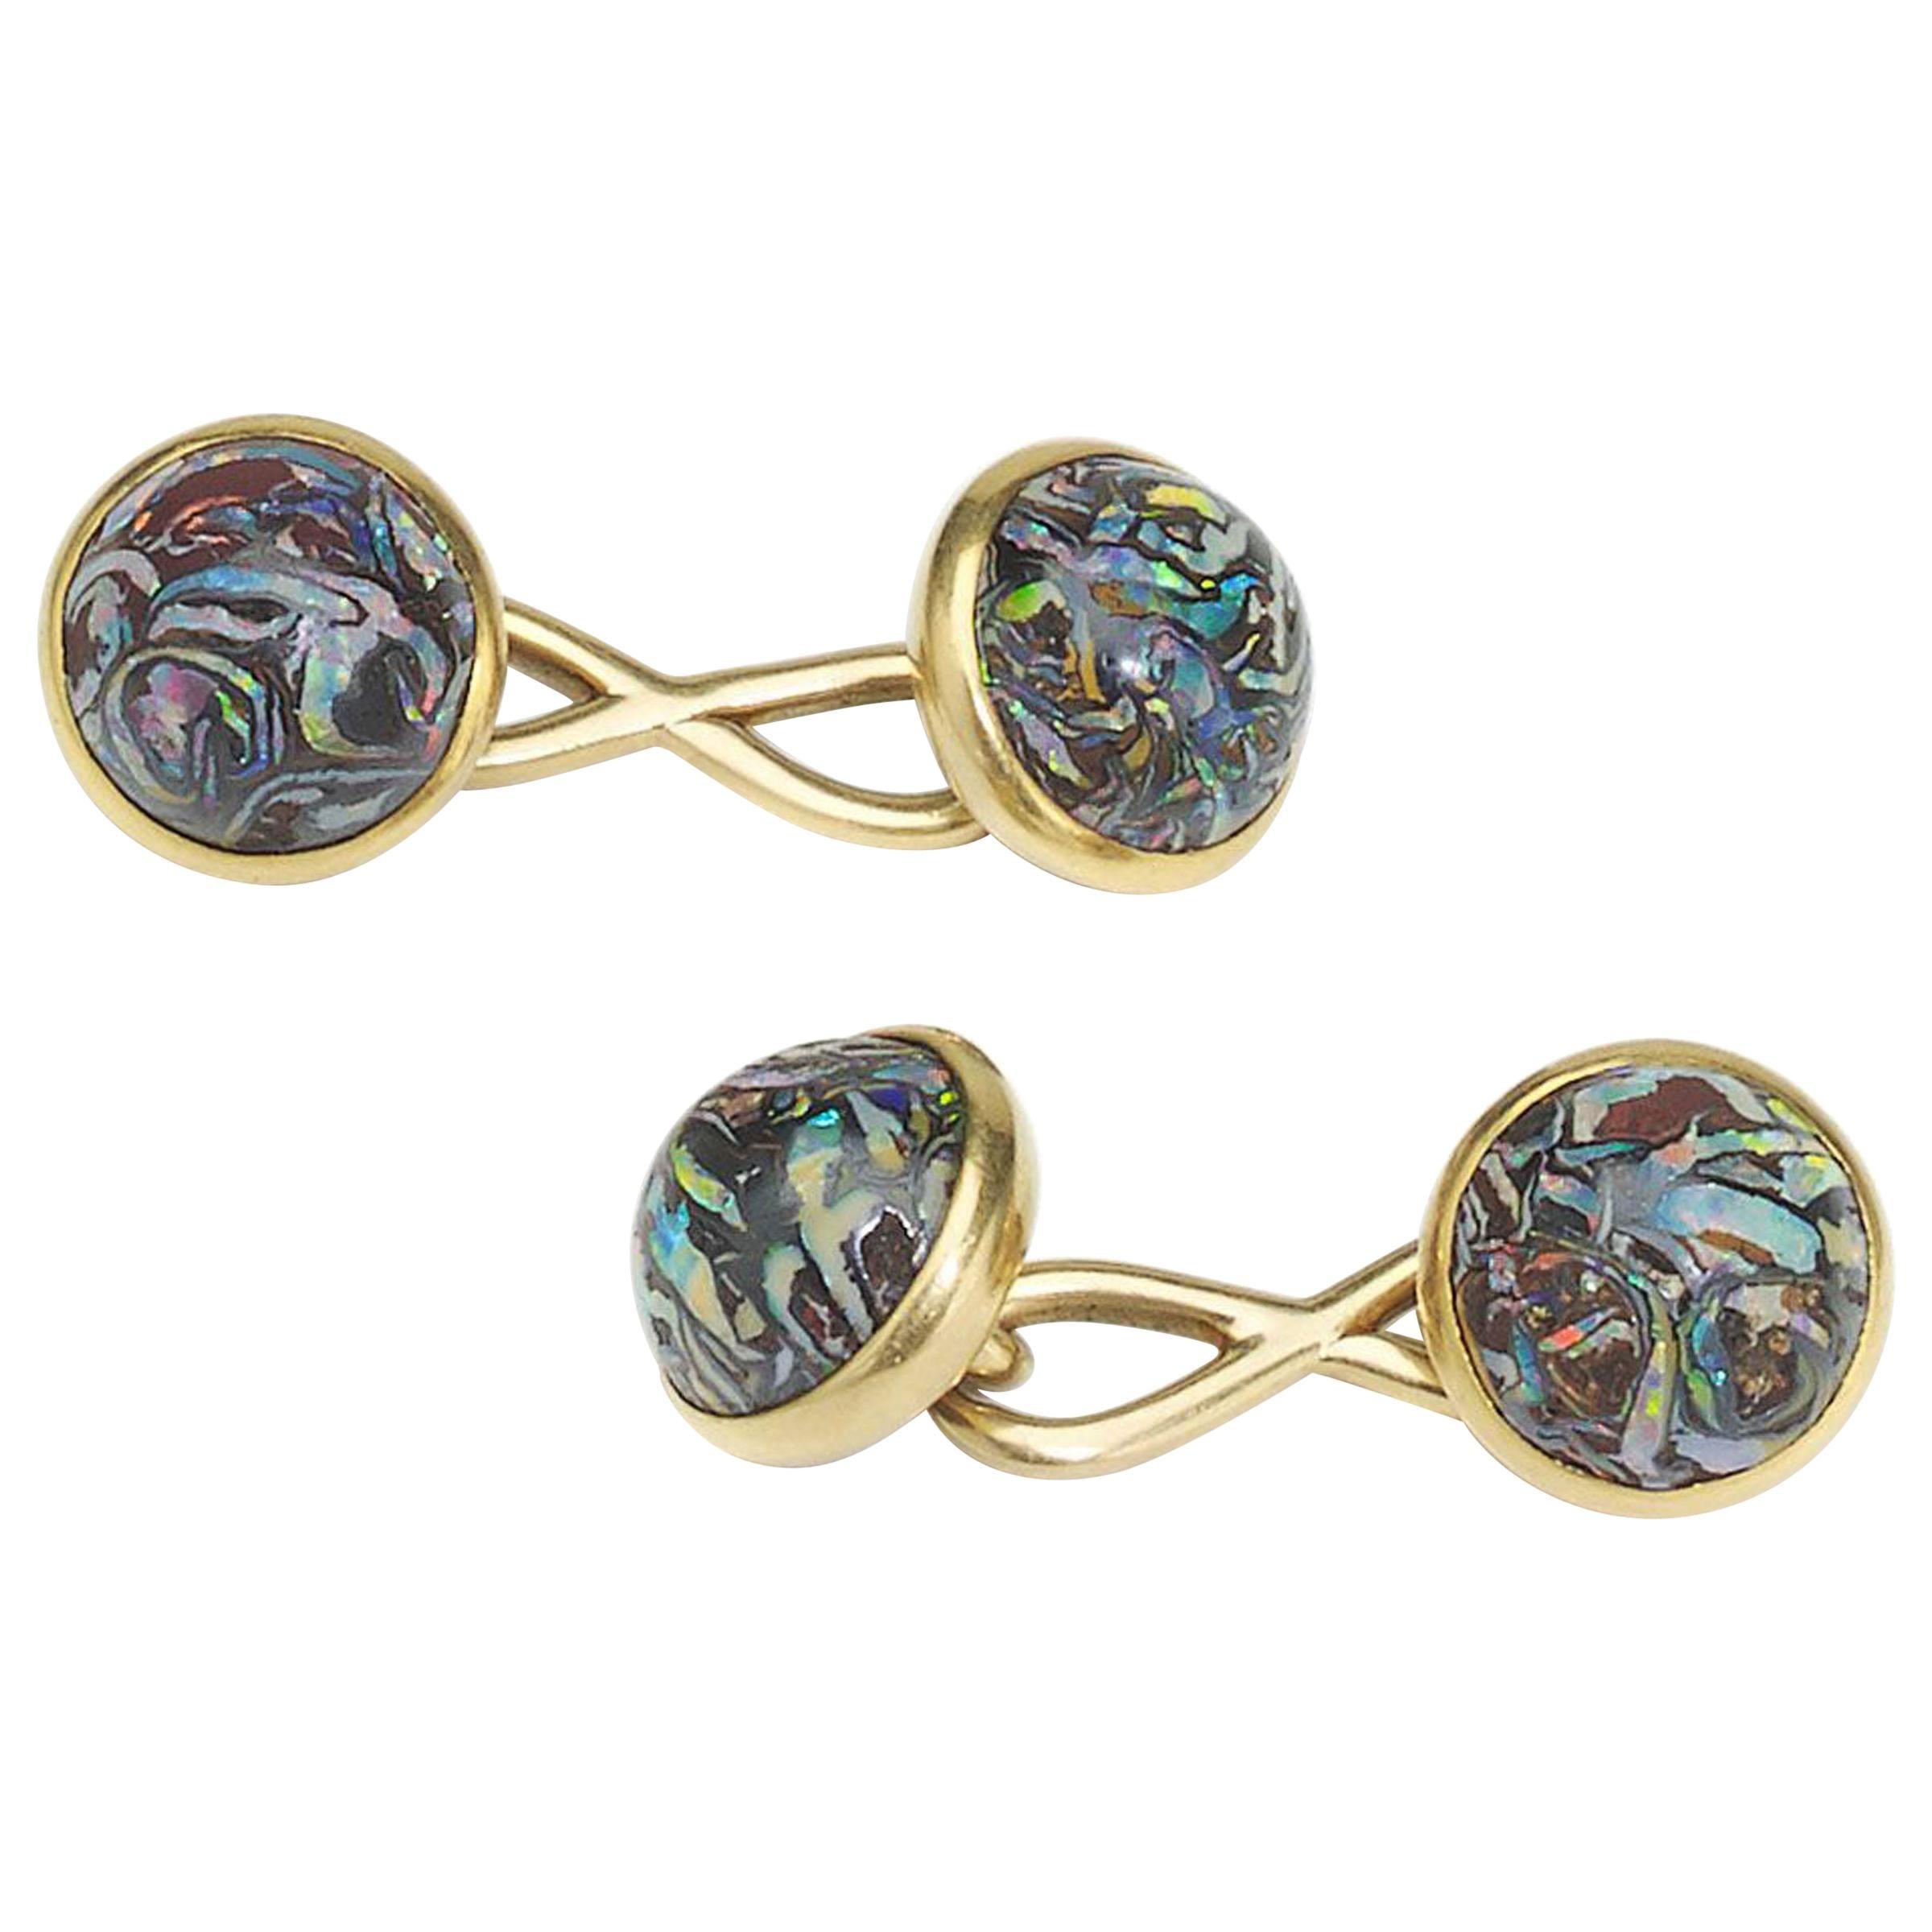 Tiffany & Co Boulder Opal and Gold Cufflinks, circa 1910